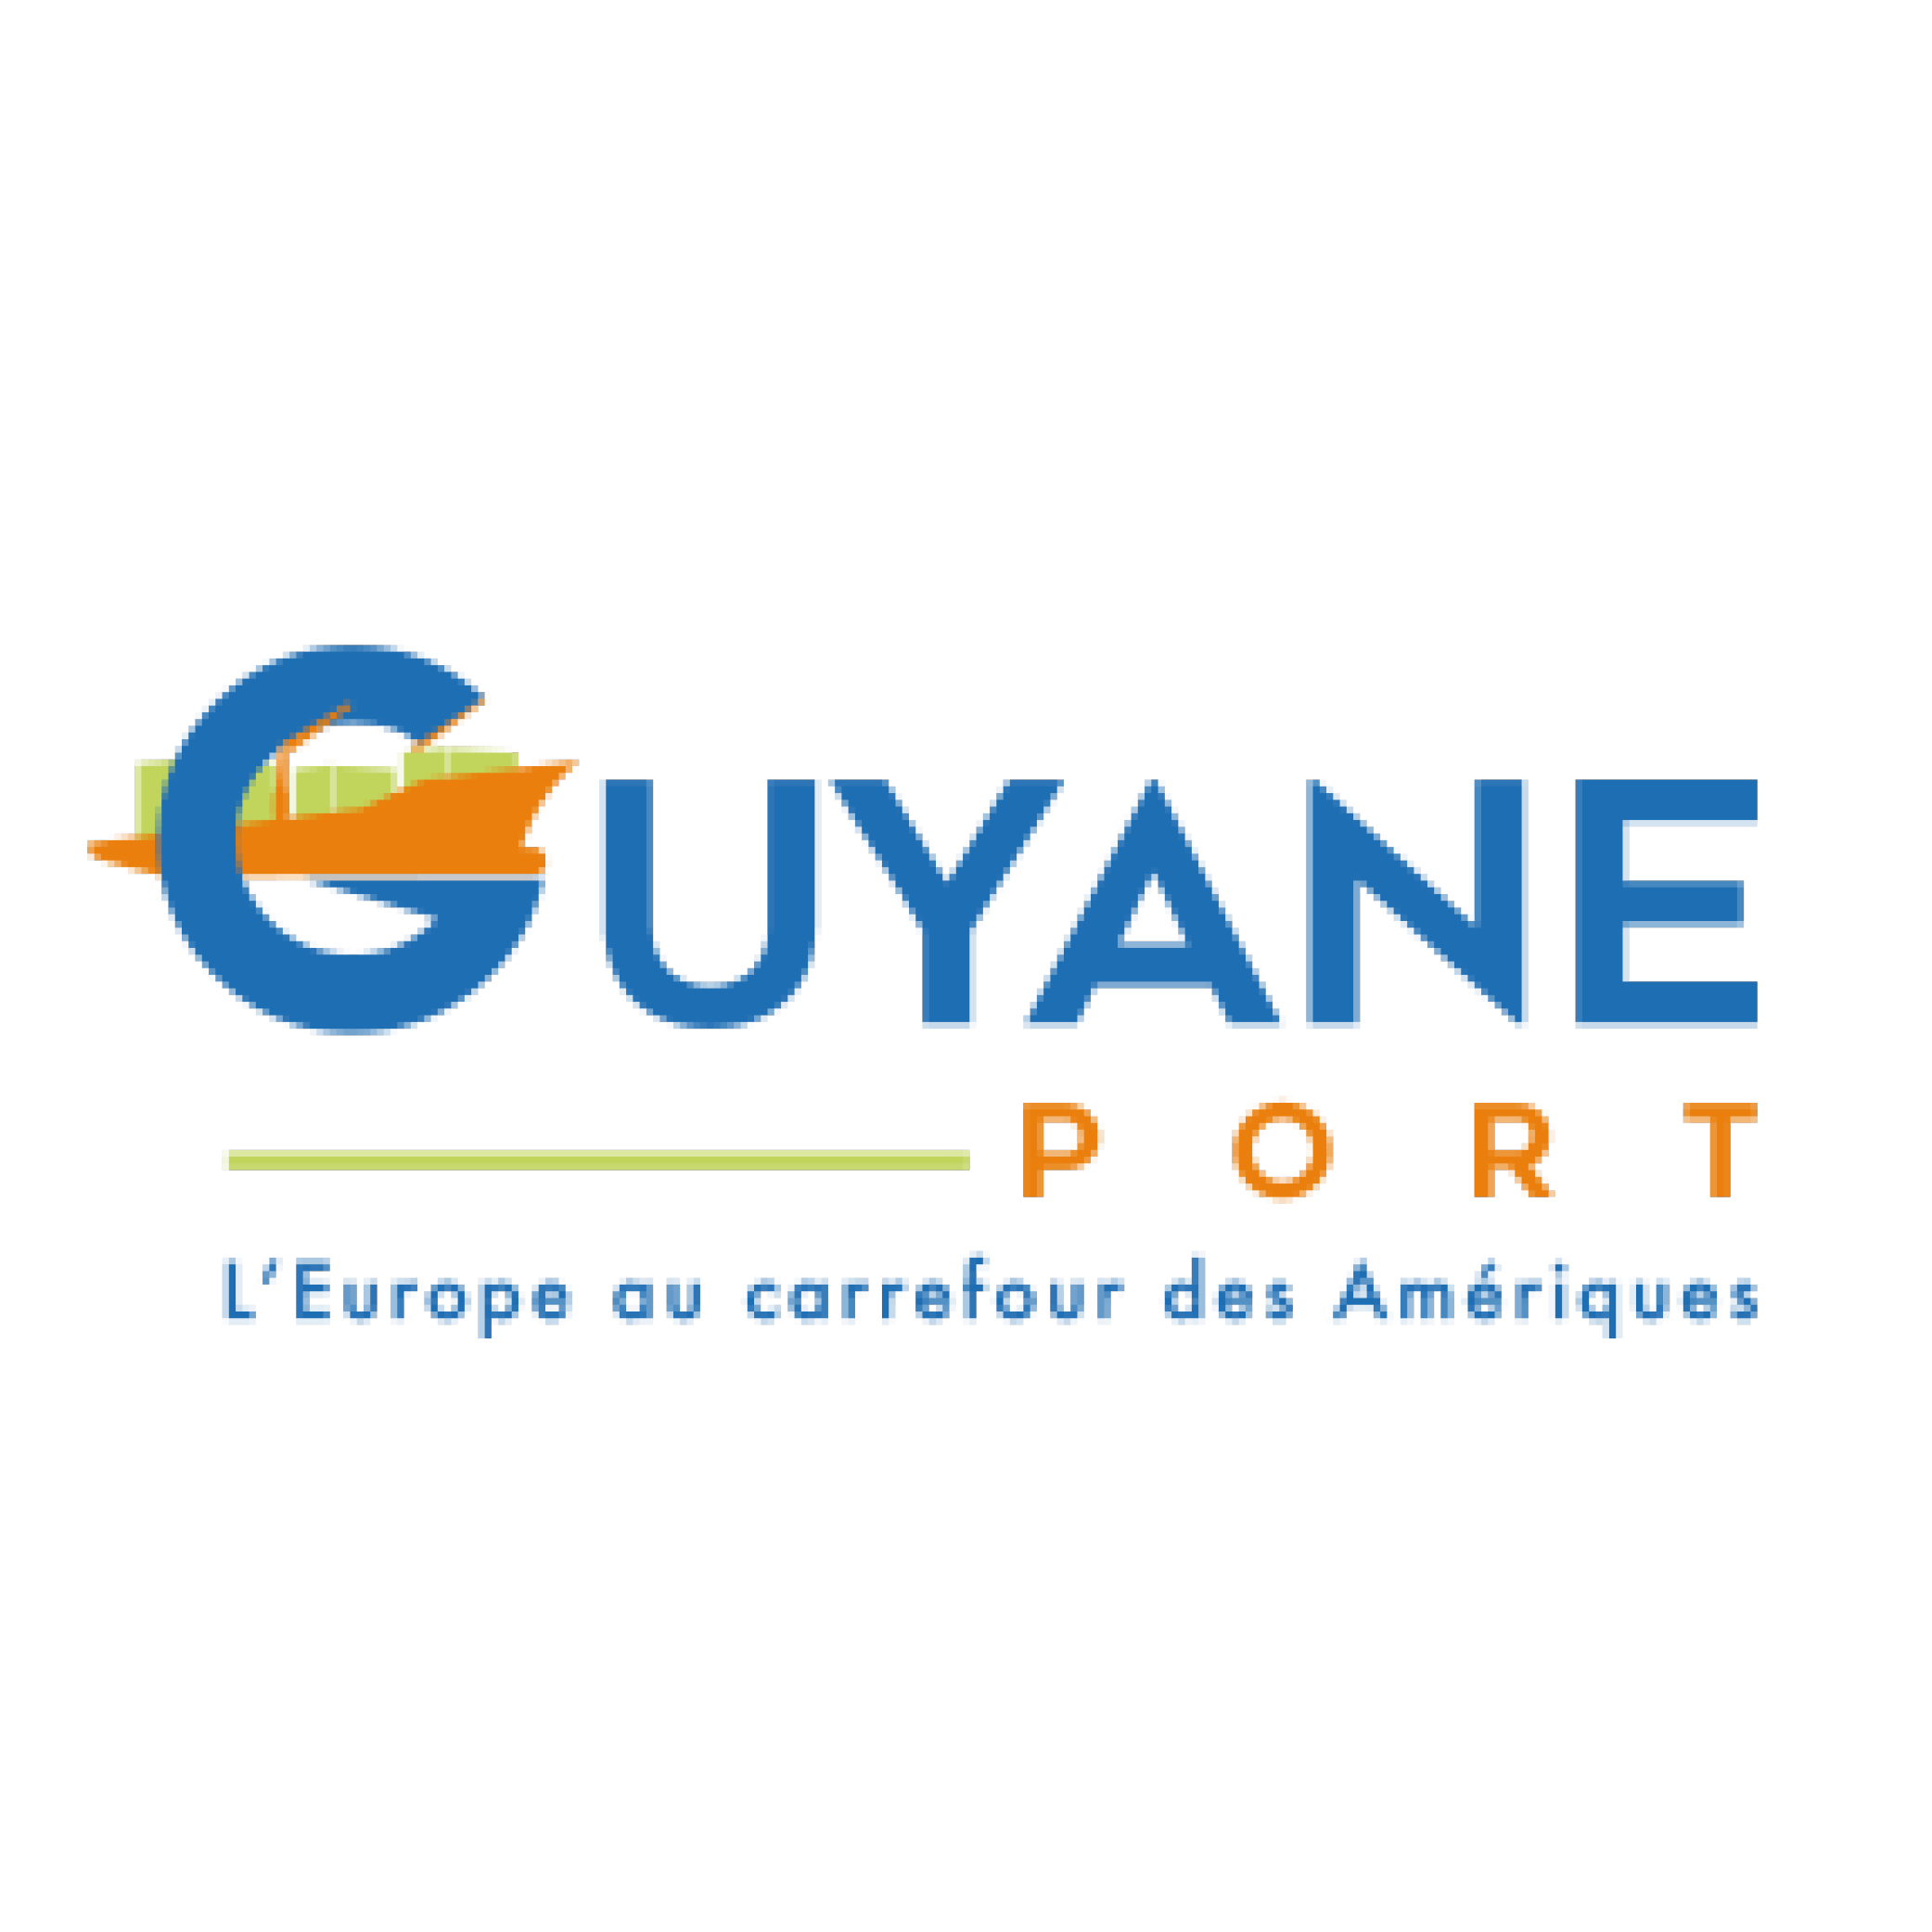 Logo - Guyanne